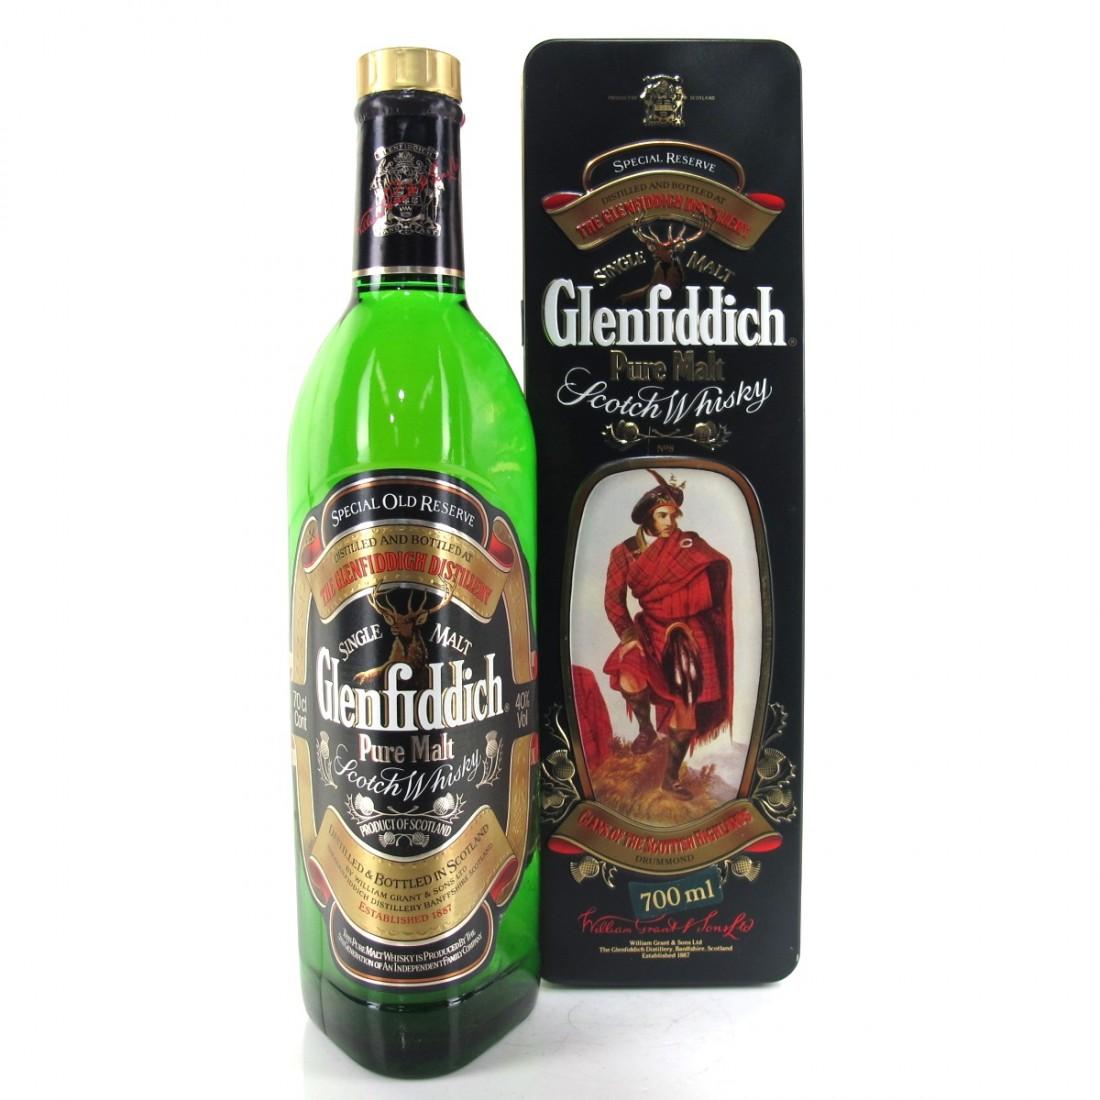 Glenfiddich Clans of the Highlands / Clan Drummond